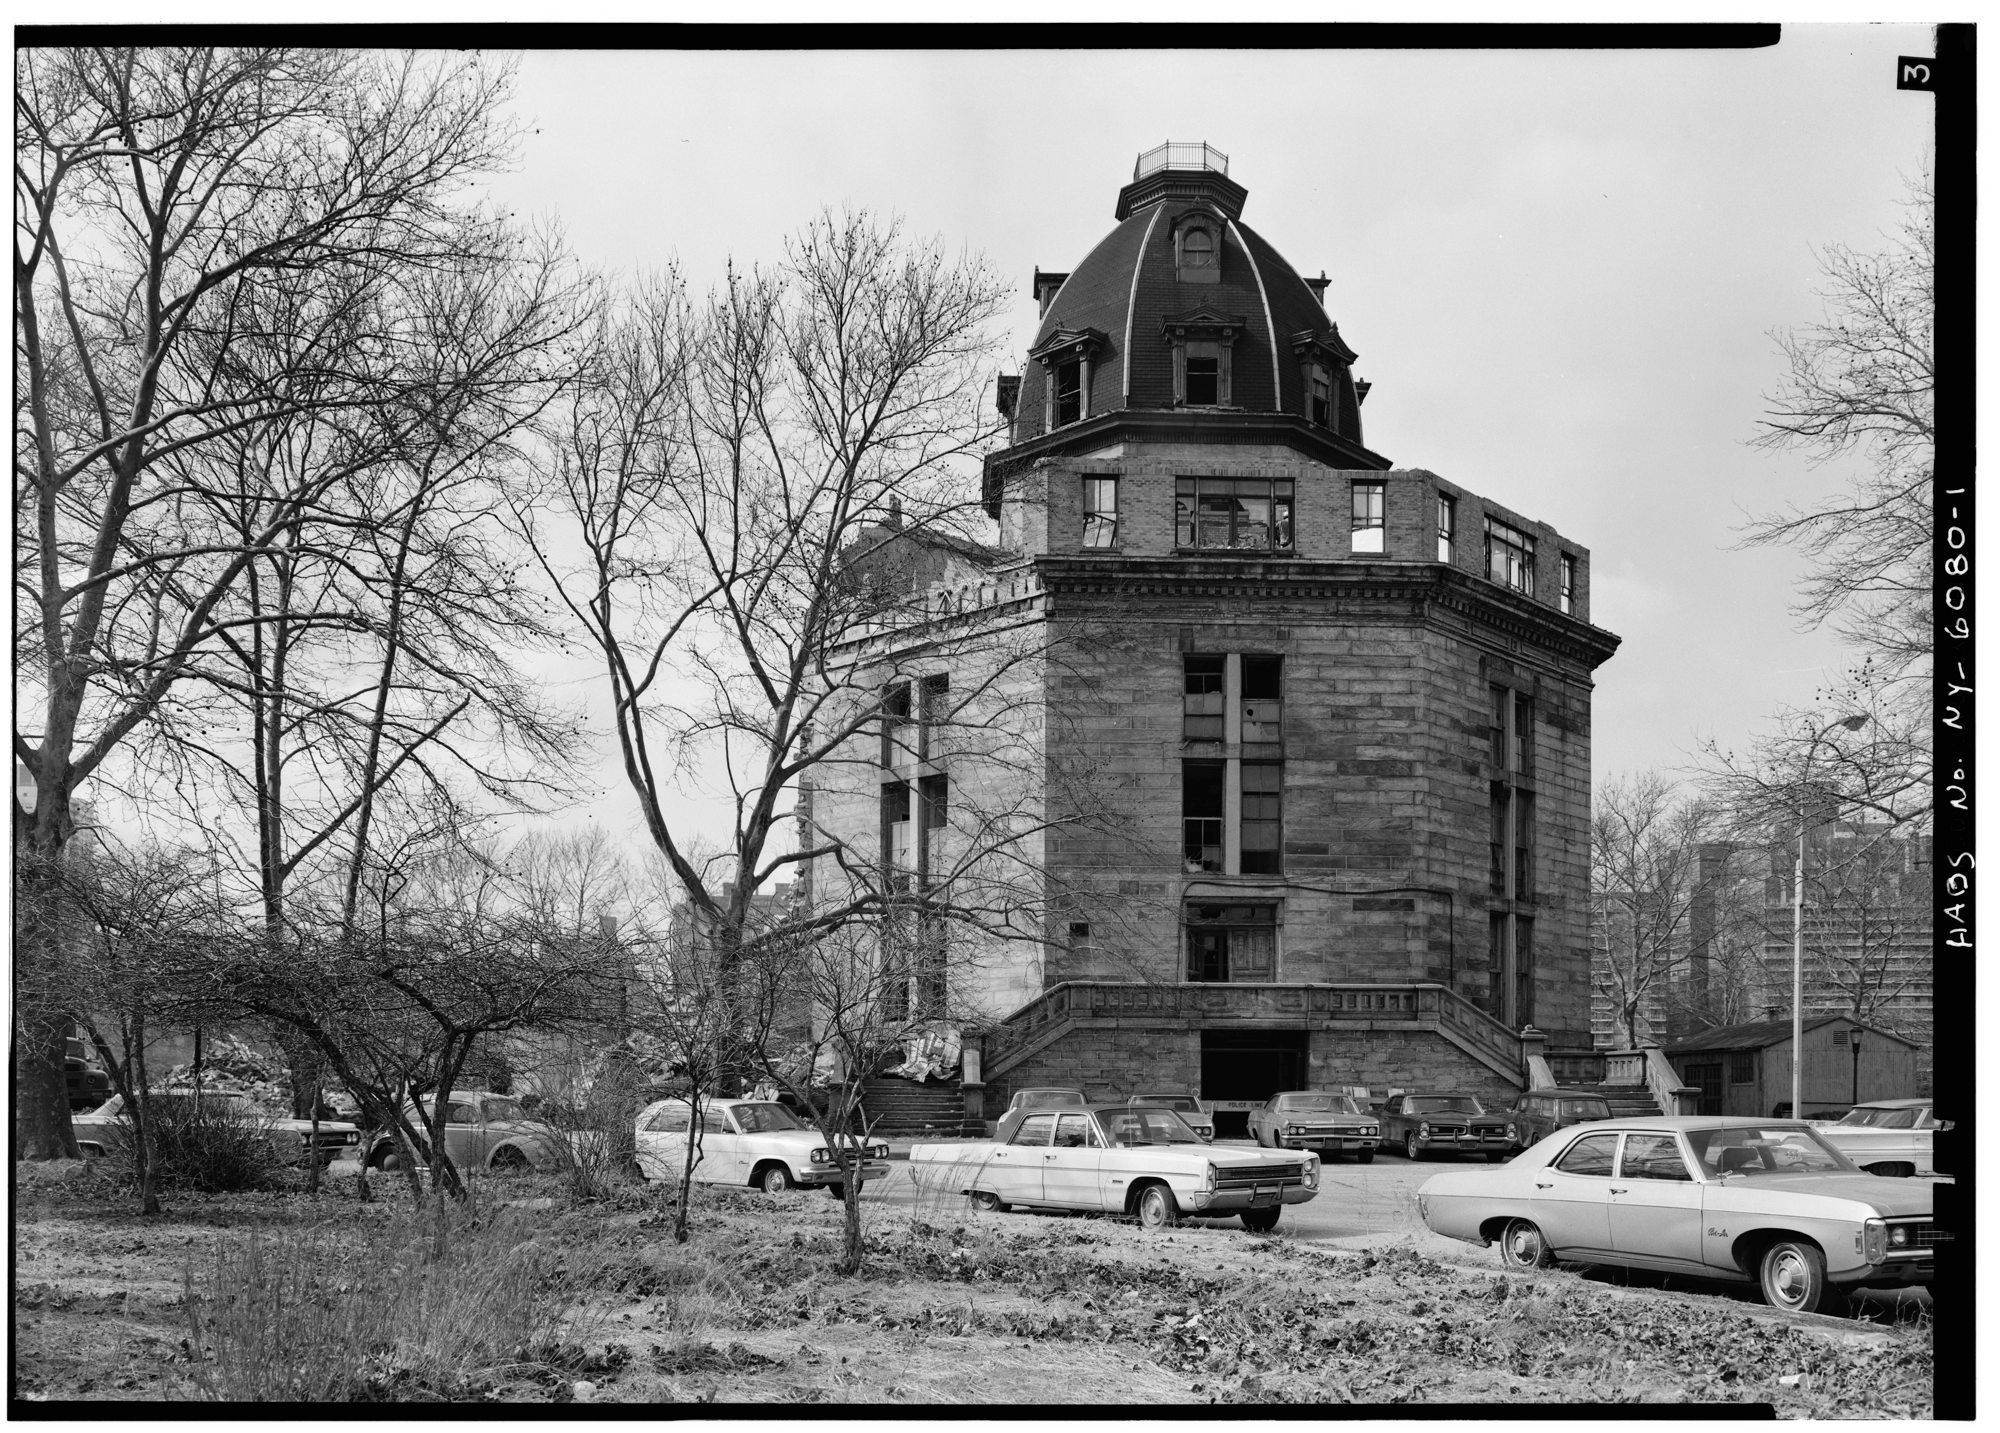 Blackwell's Island Lunatic Asylum Octagon